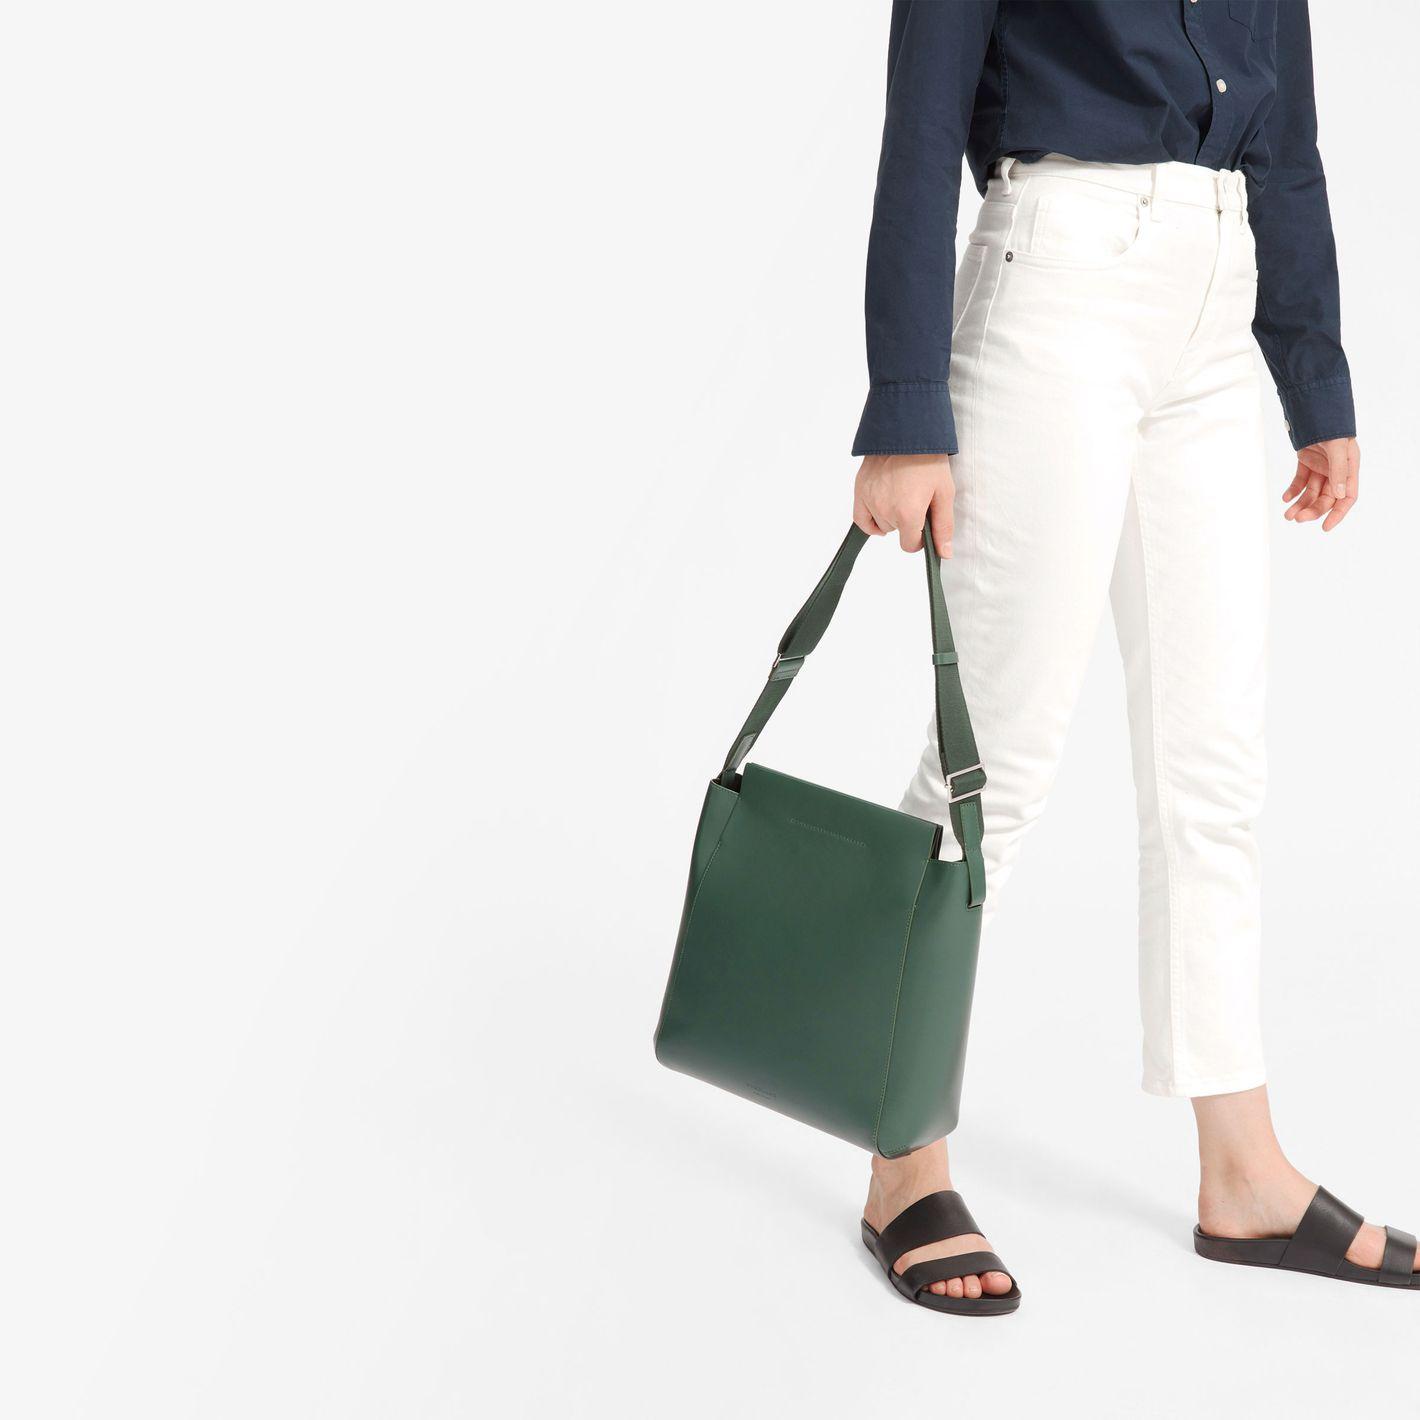 Everlane The Form Bag in Dark Green